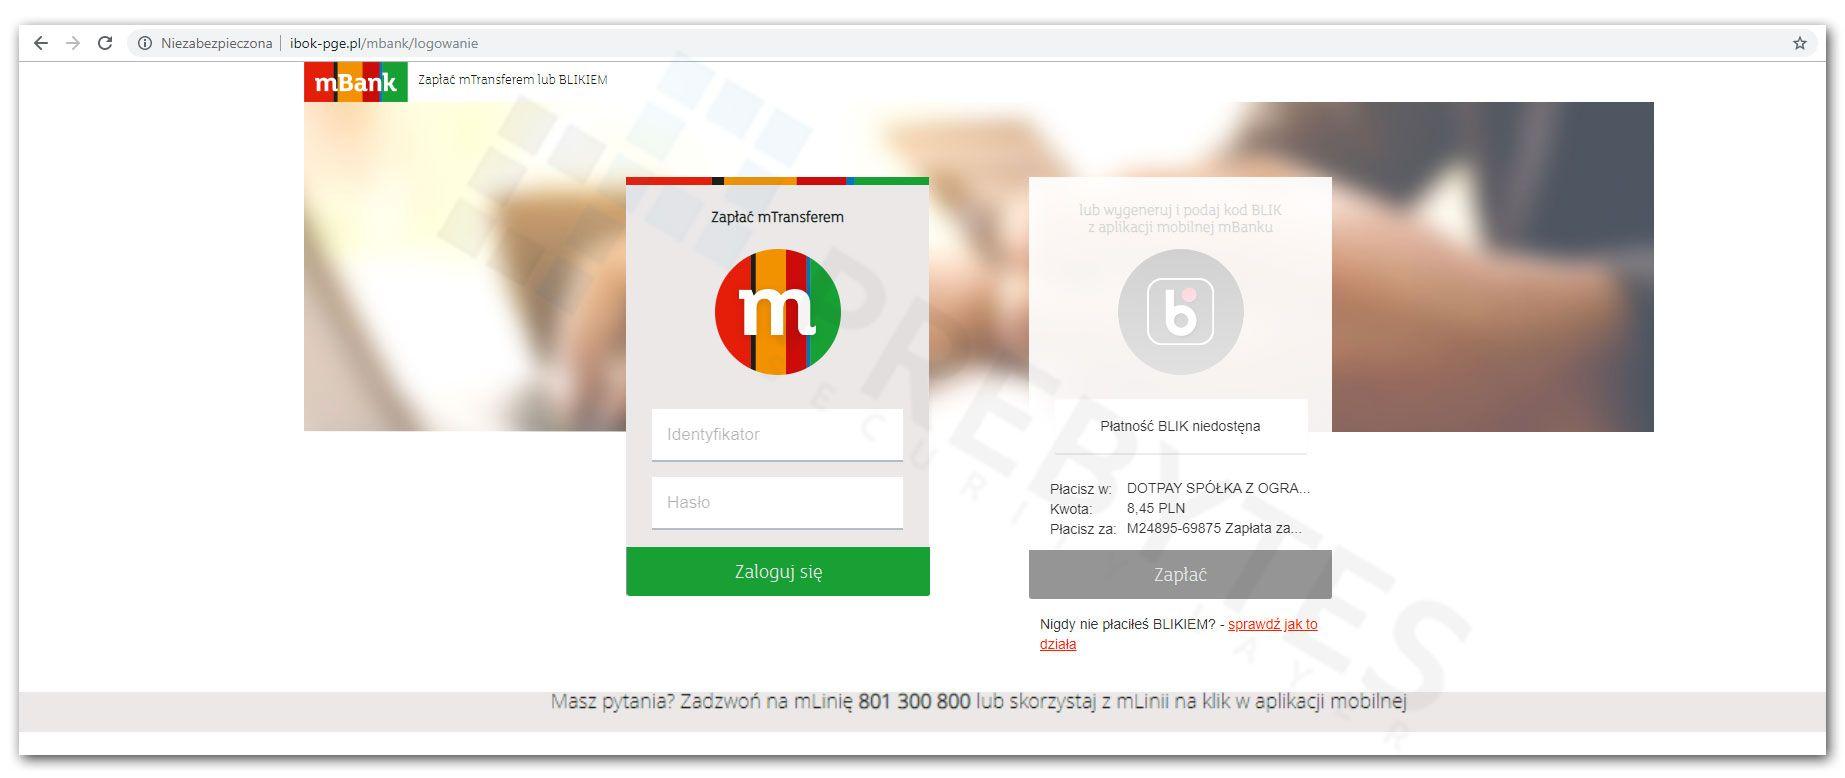 mbank2